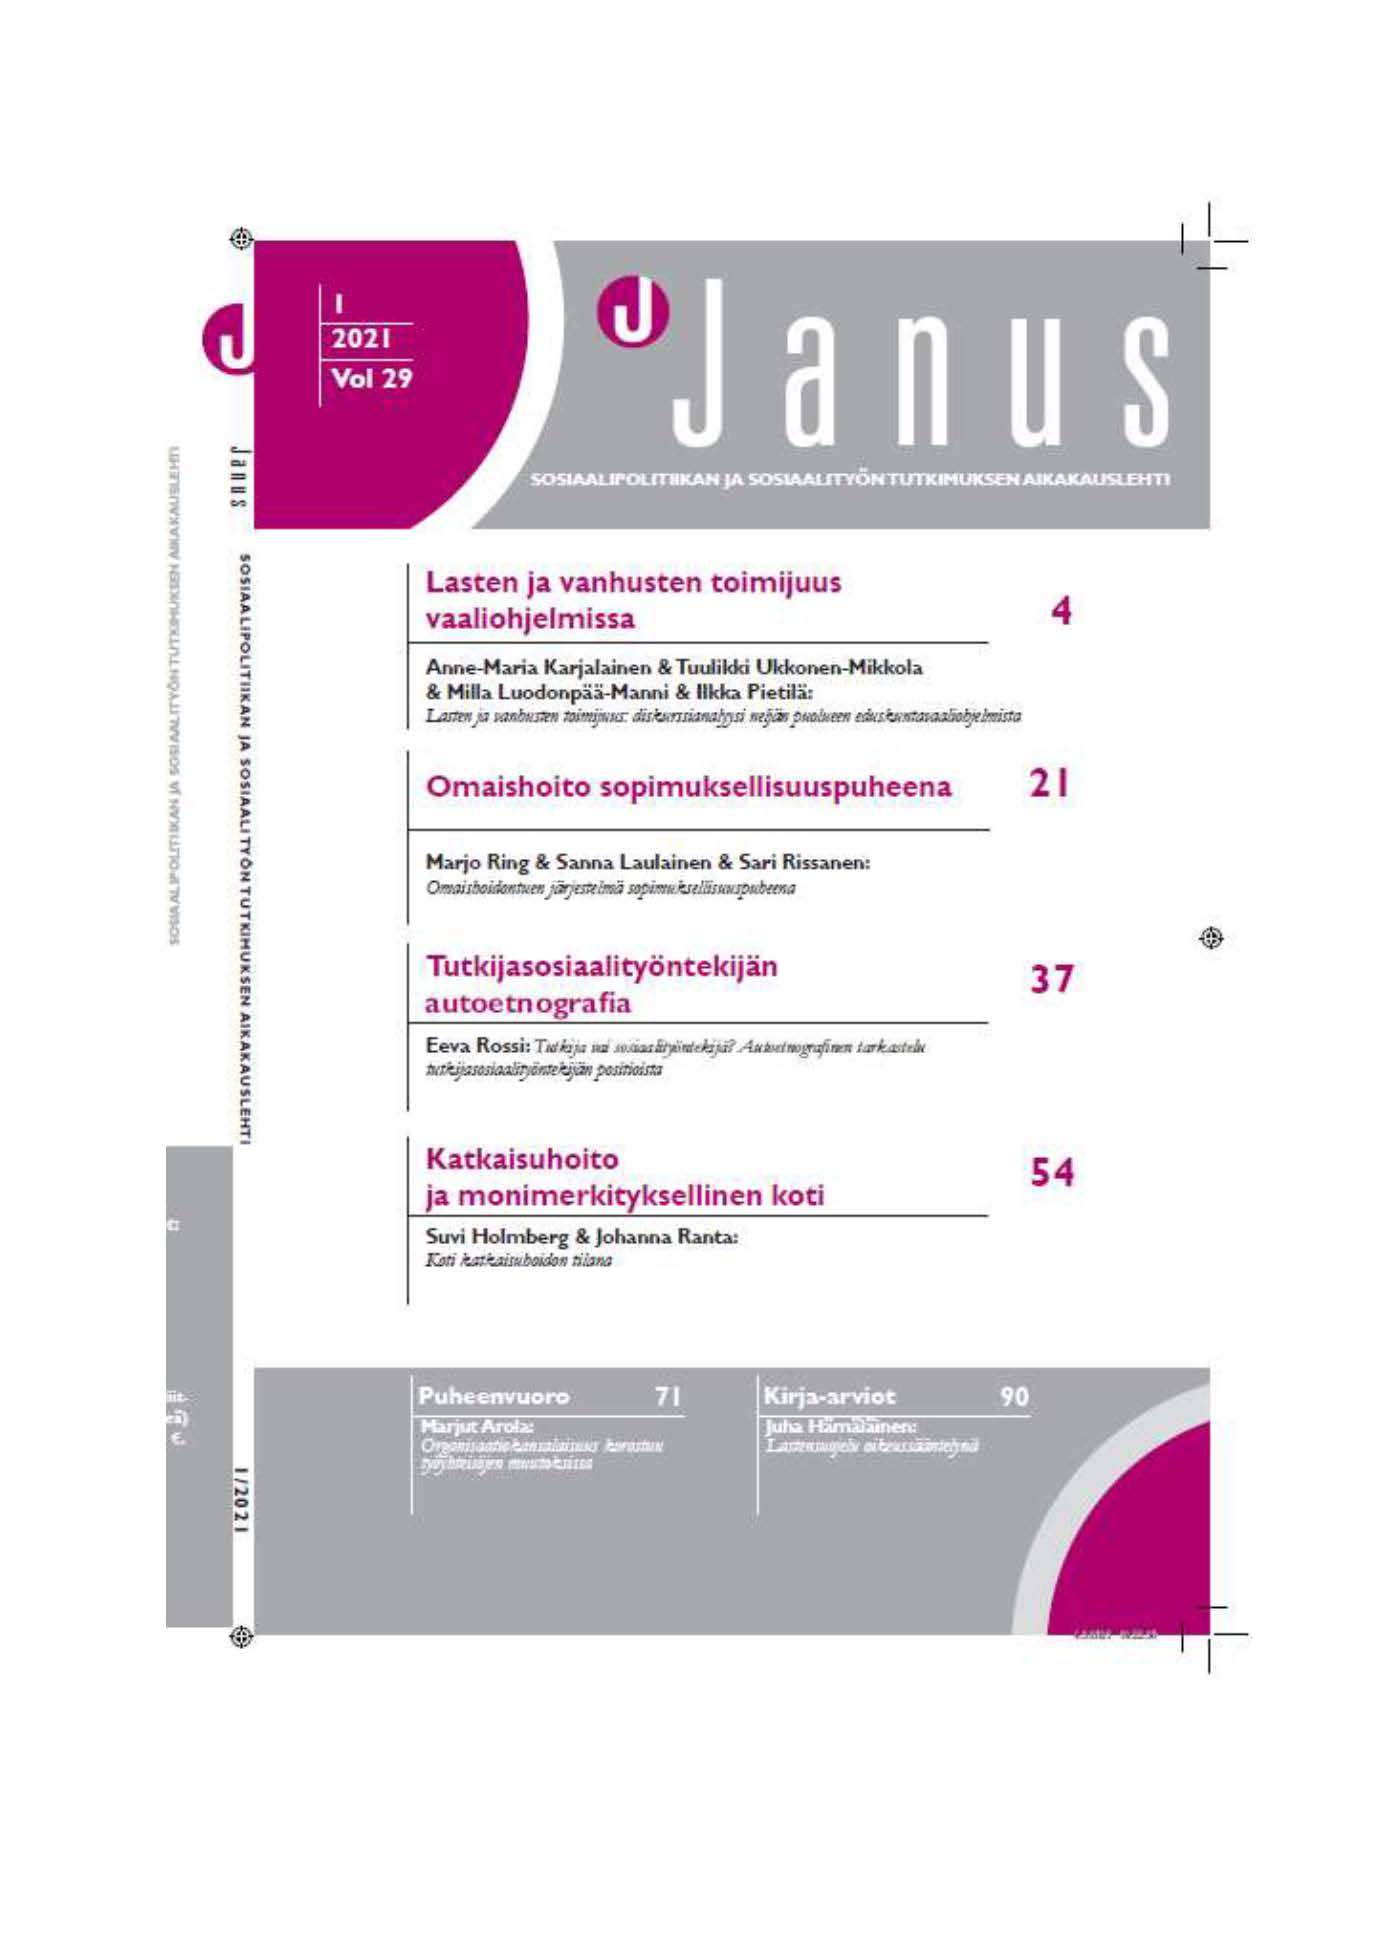 Janus kansilehti 1/2021